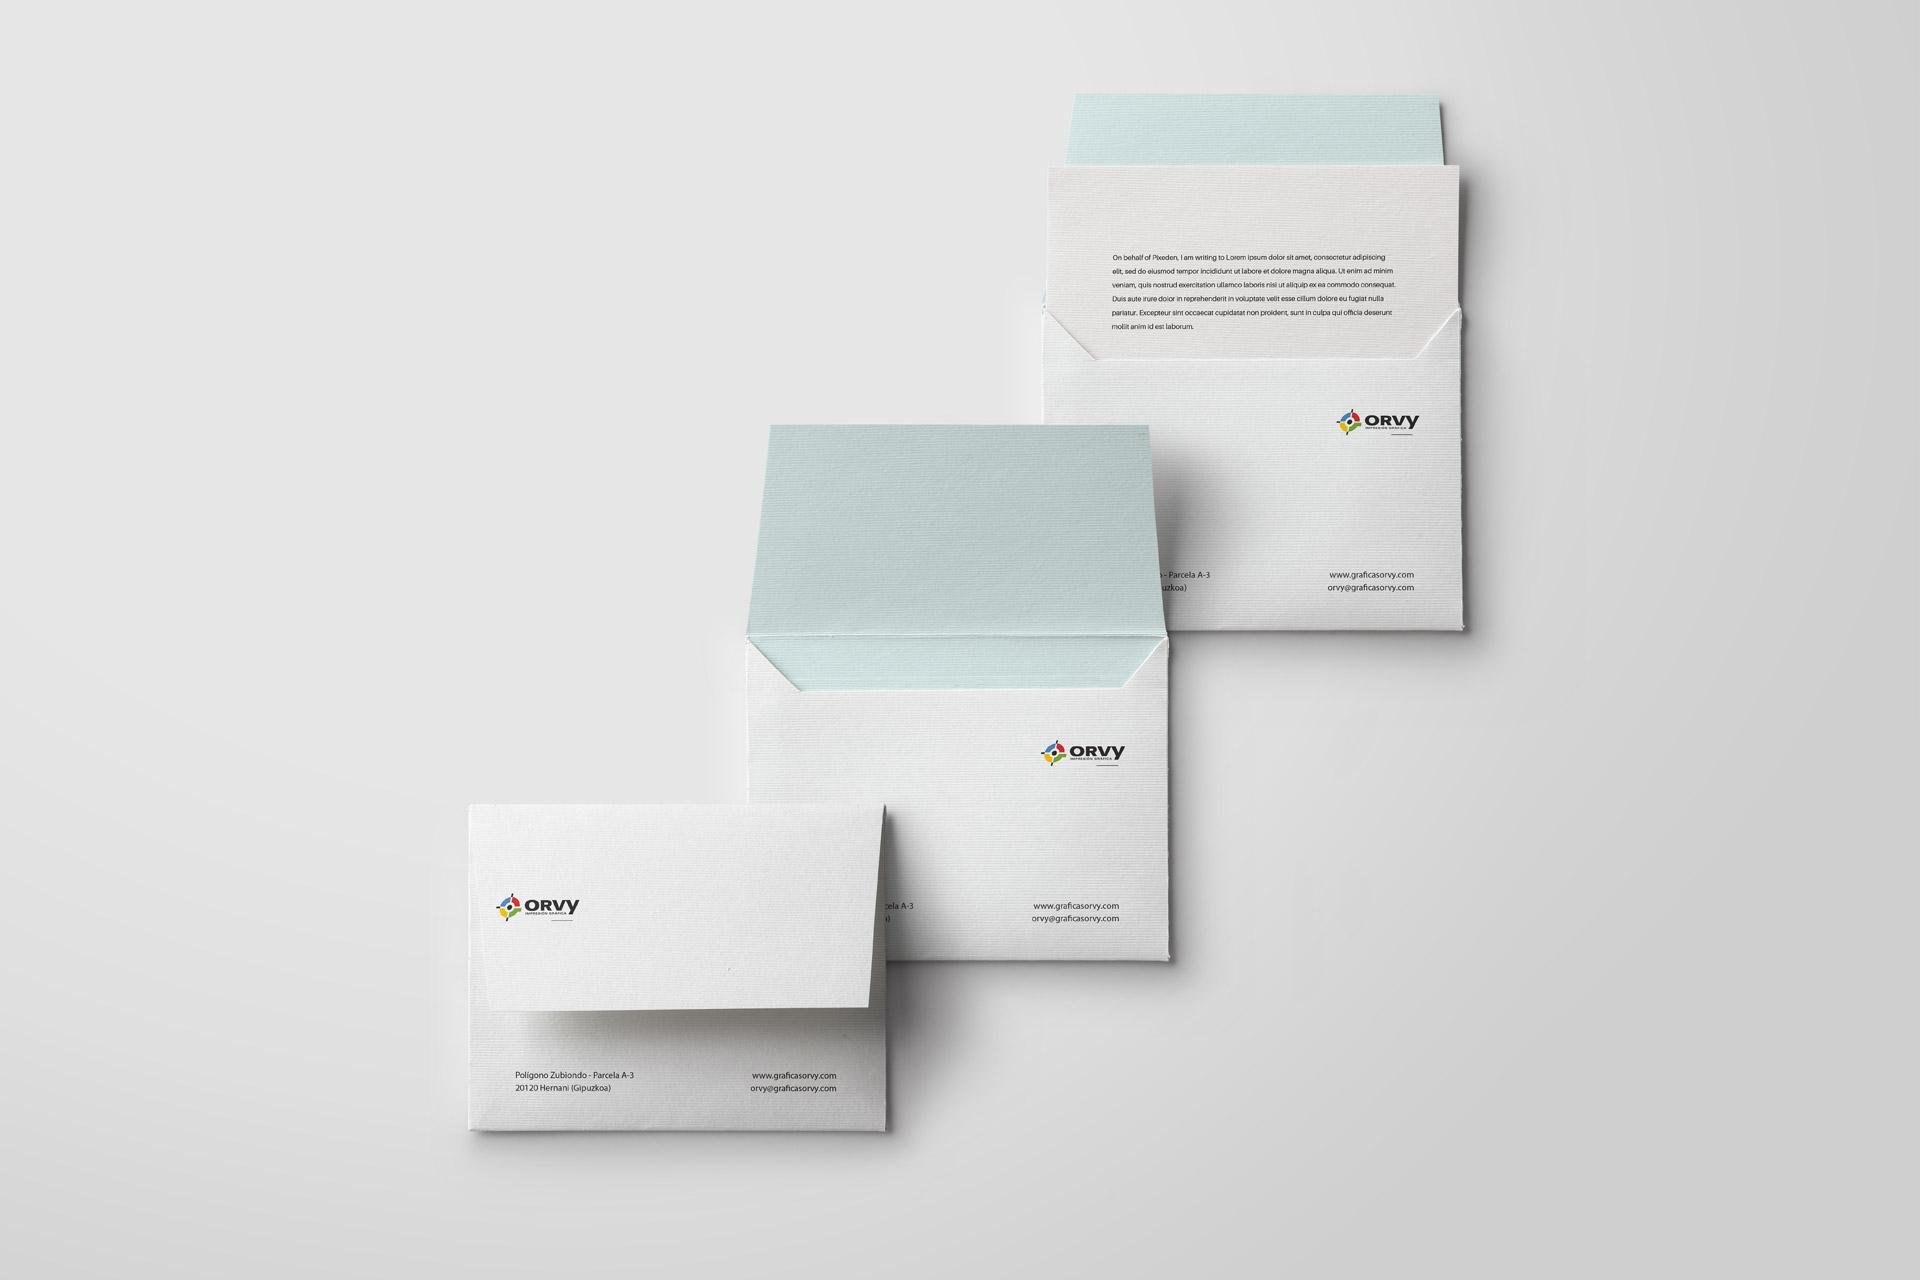 a96789eab Sobres y Bolsas   ORVY - Impresión Gráfica